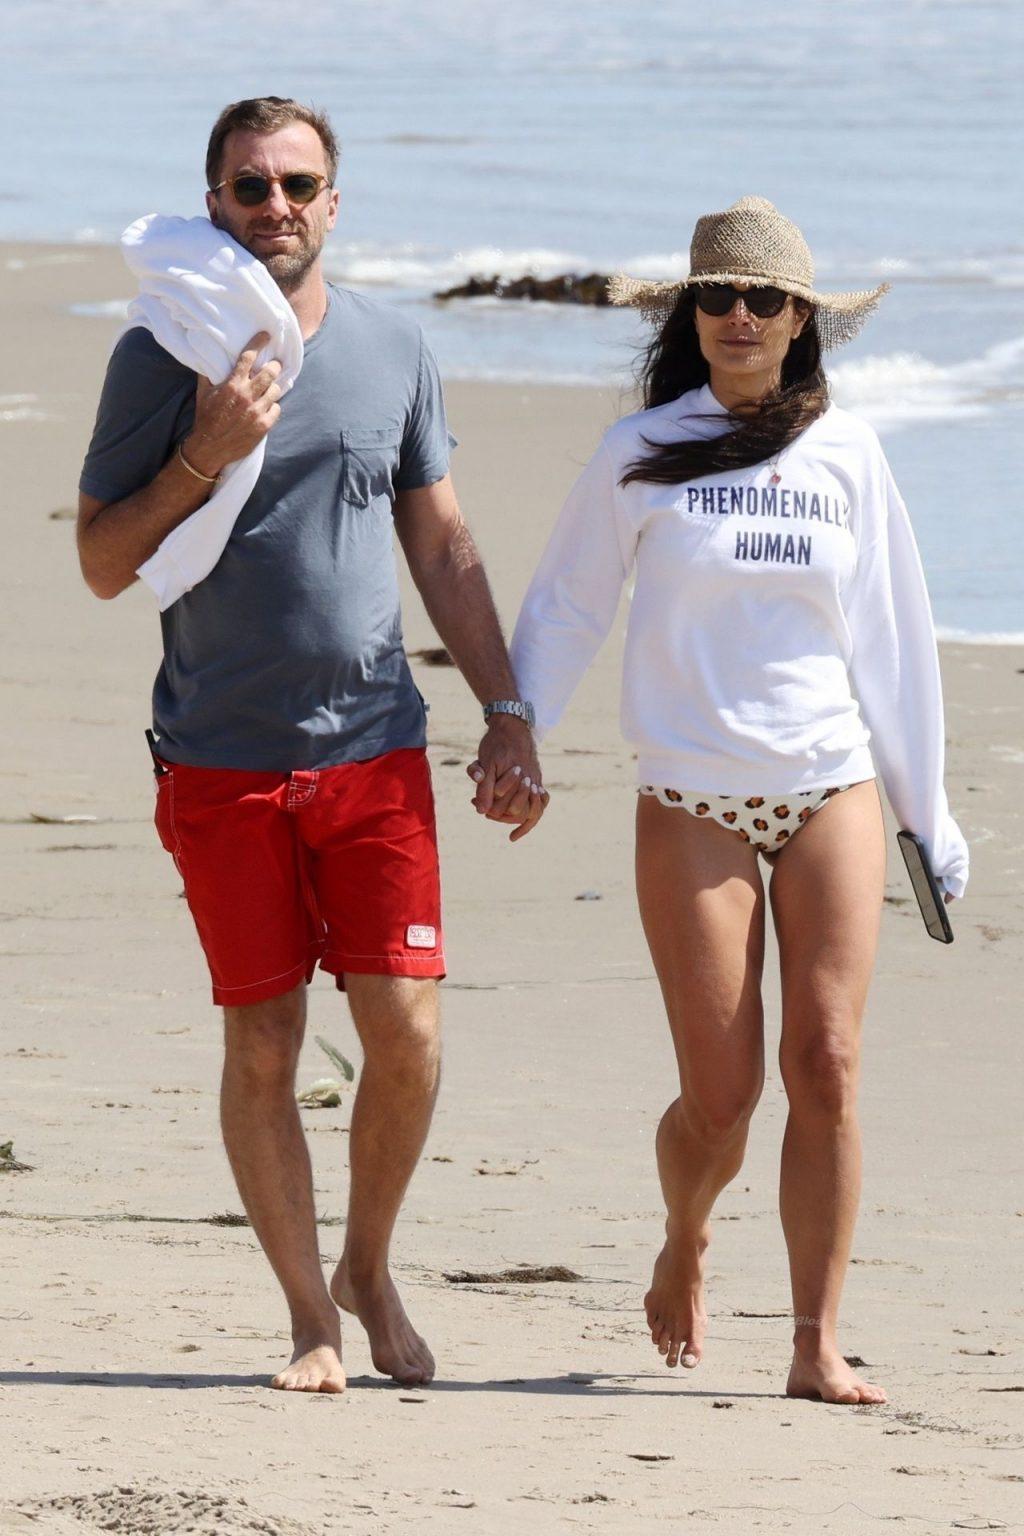 Jordana Brewster Looks Half Her Age Frolicking on the Beach (27 Photos)